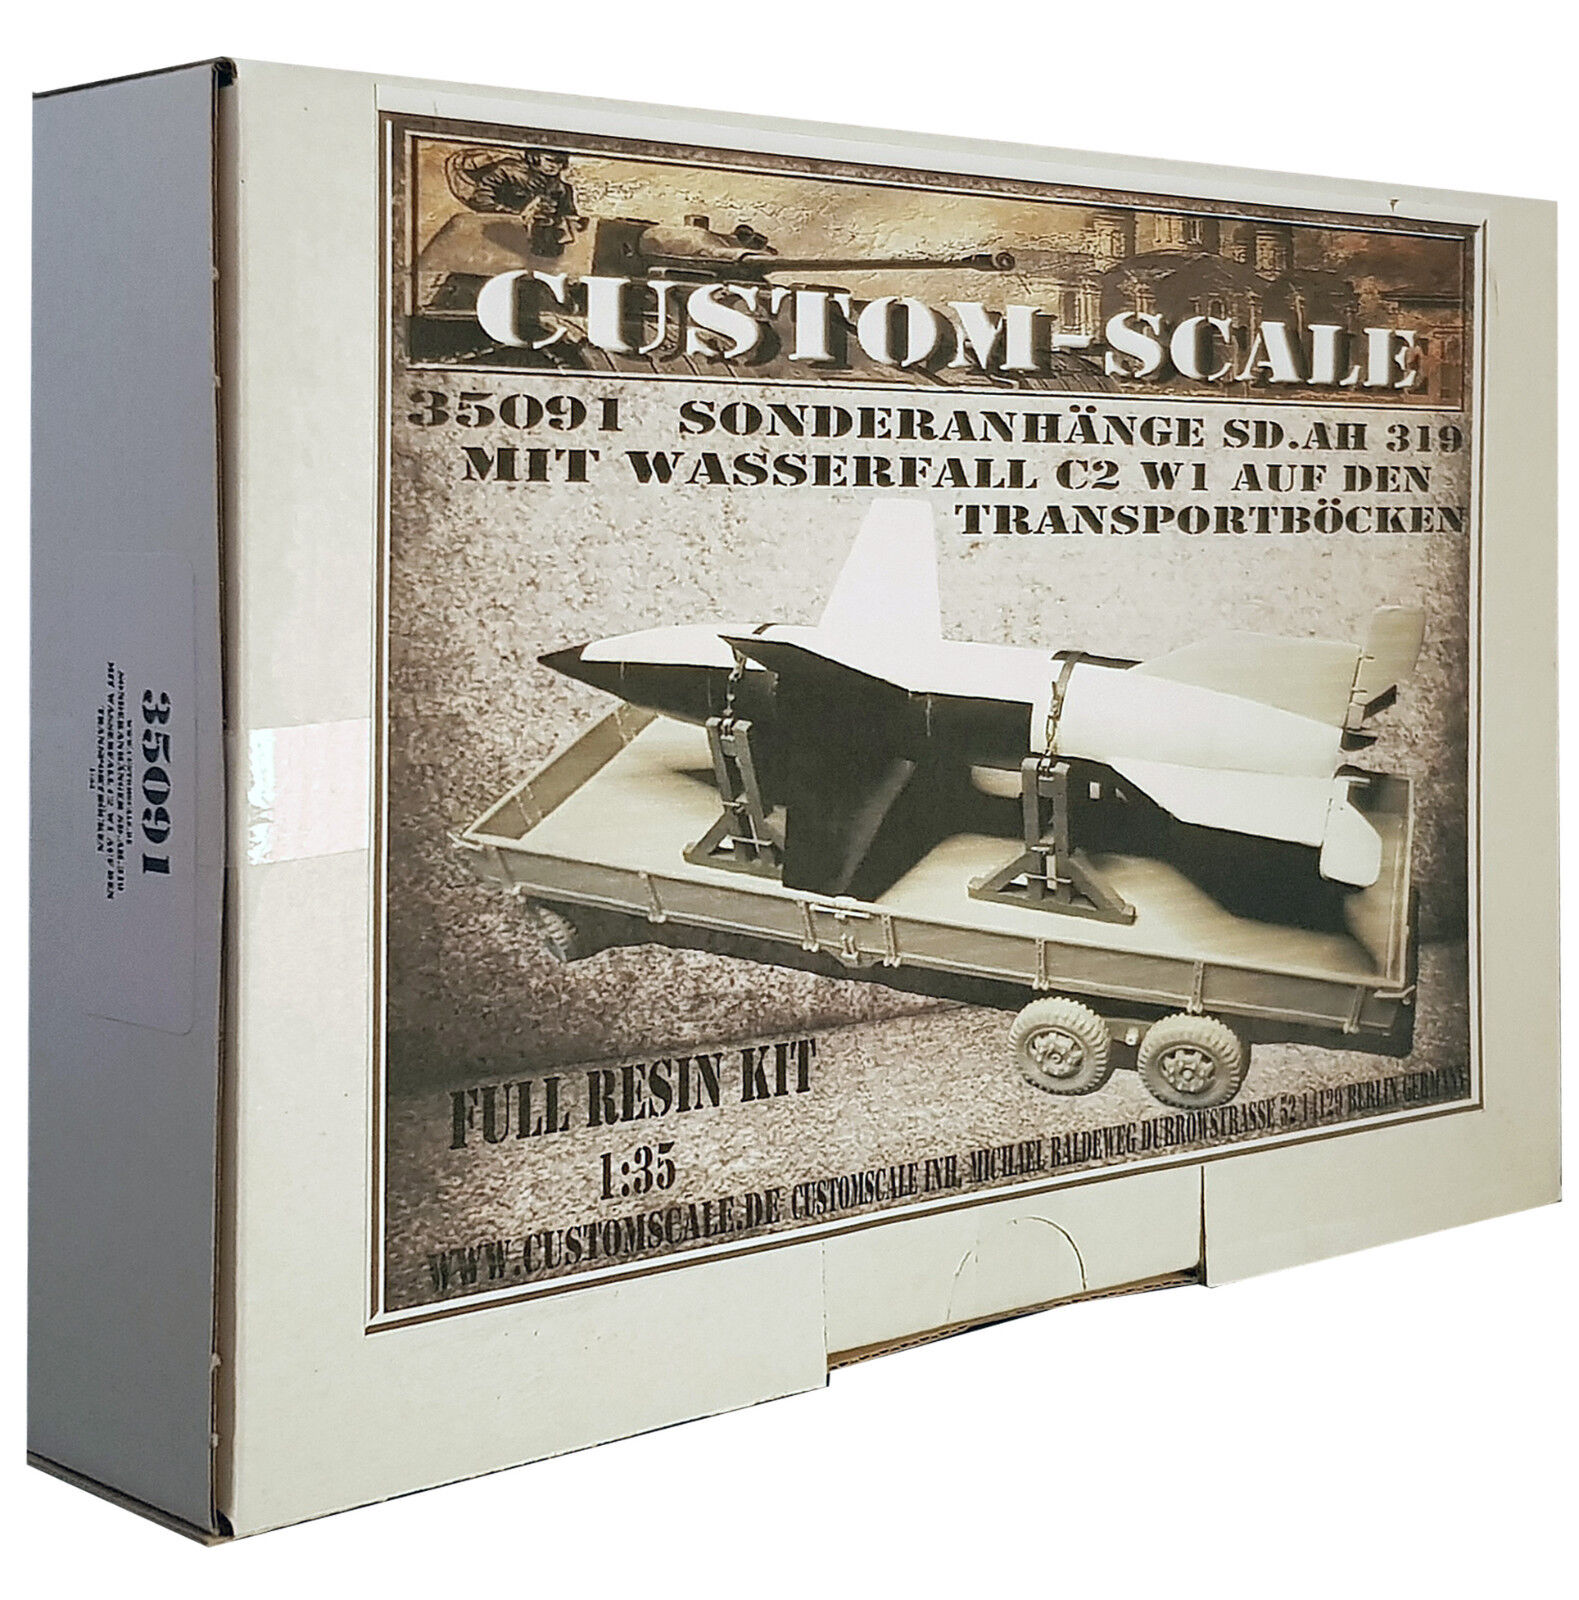 1 35 35091 Sonderanhänger Sd.Ah. 319 mit Wasserfall Full Resin Kit Custom-Scale    Qualität und Quantität garantiert